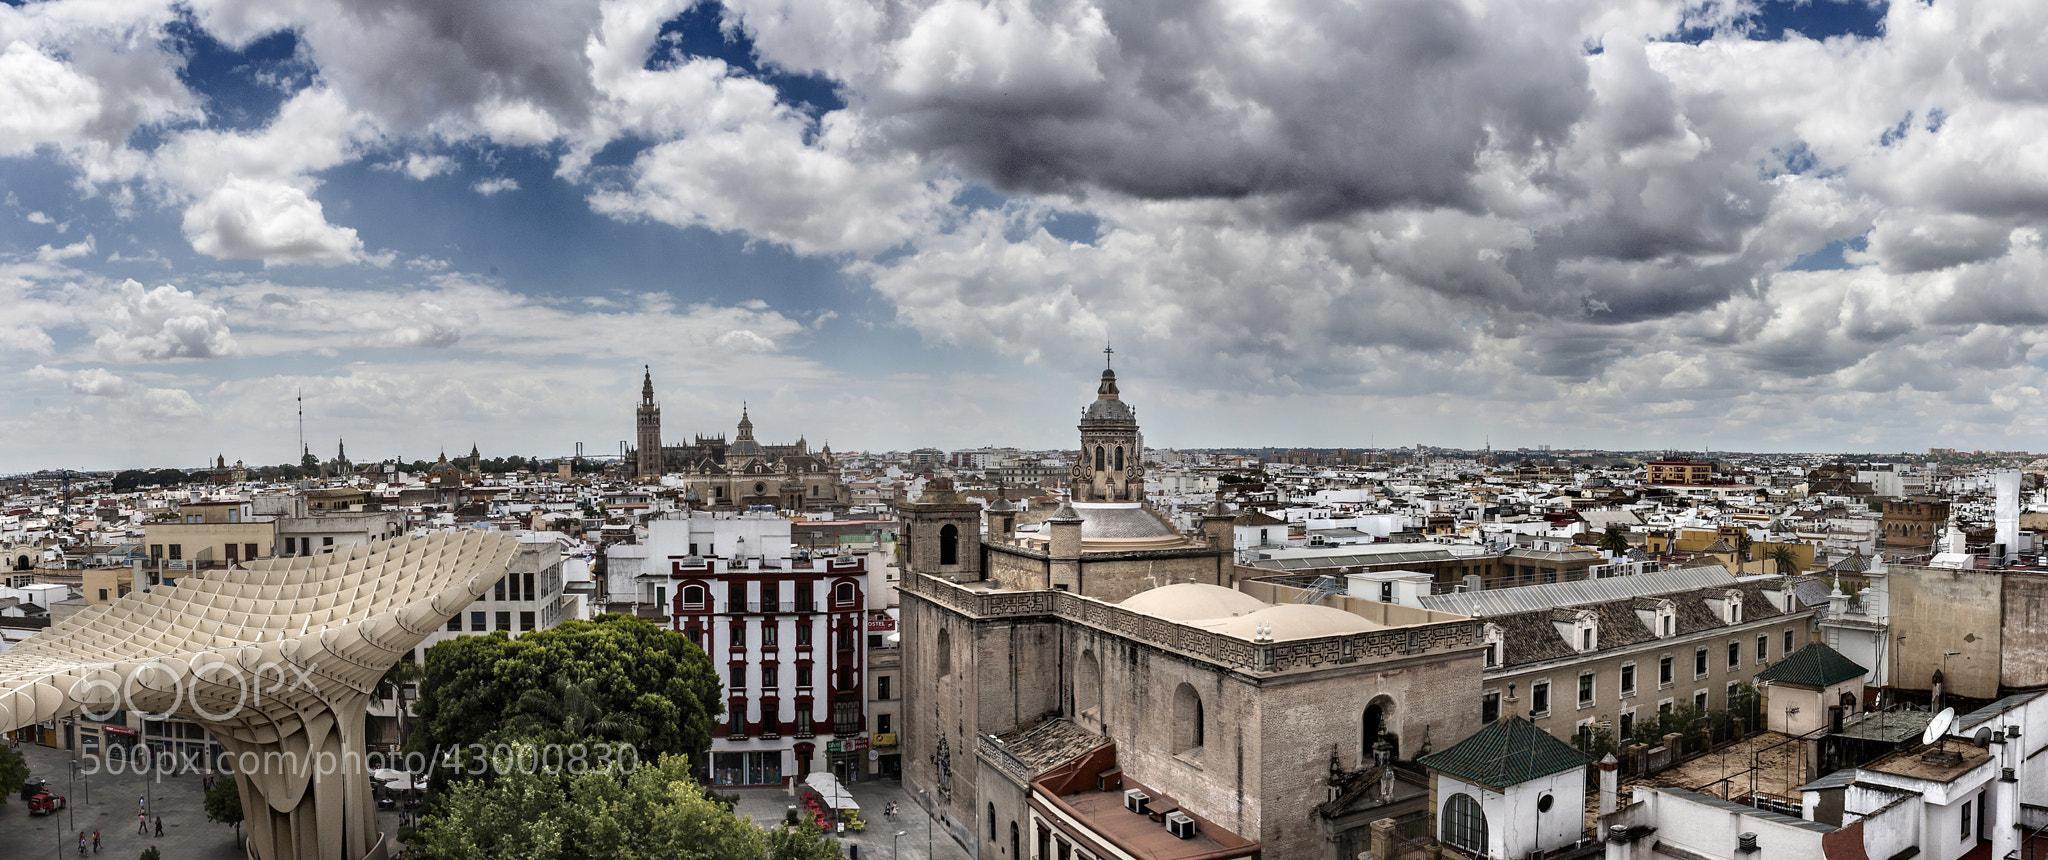 Photograph Sevilla desde Las Setas by Jesús Sánchez Ibáñez on 500px